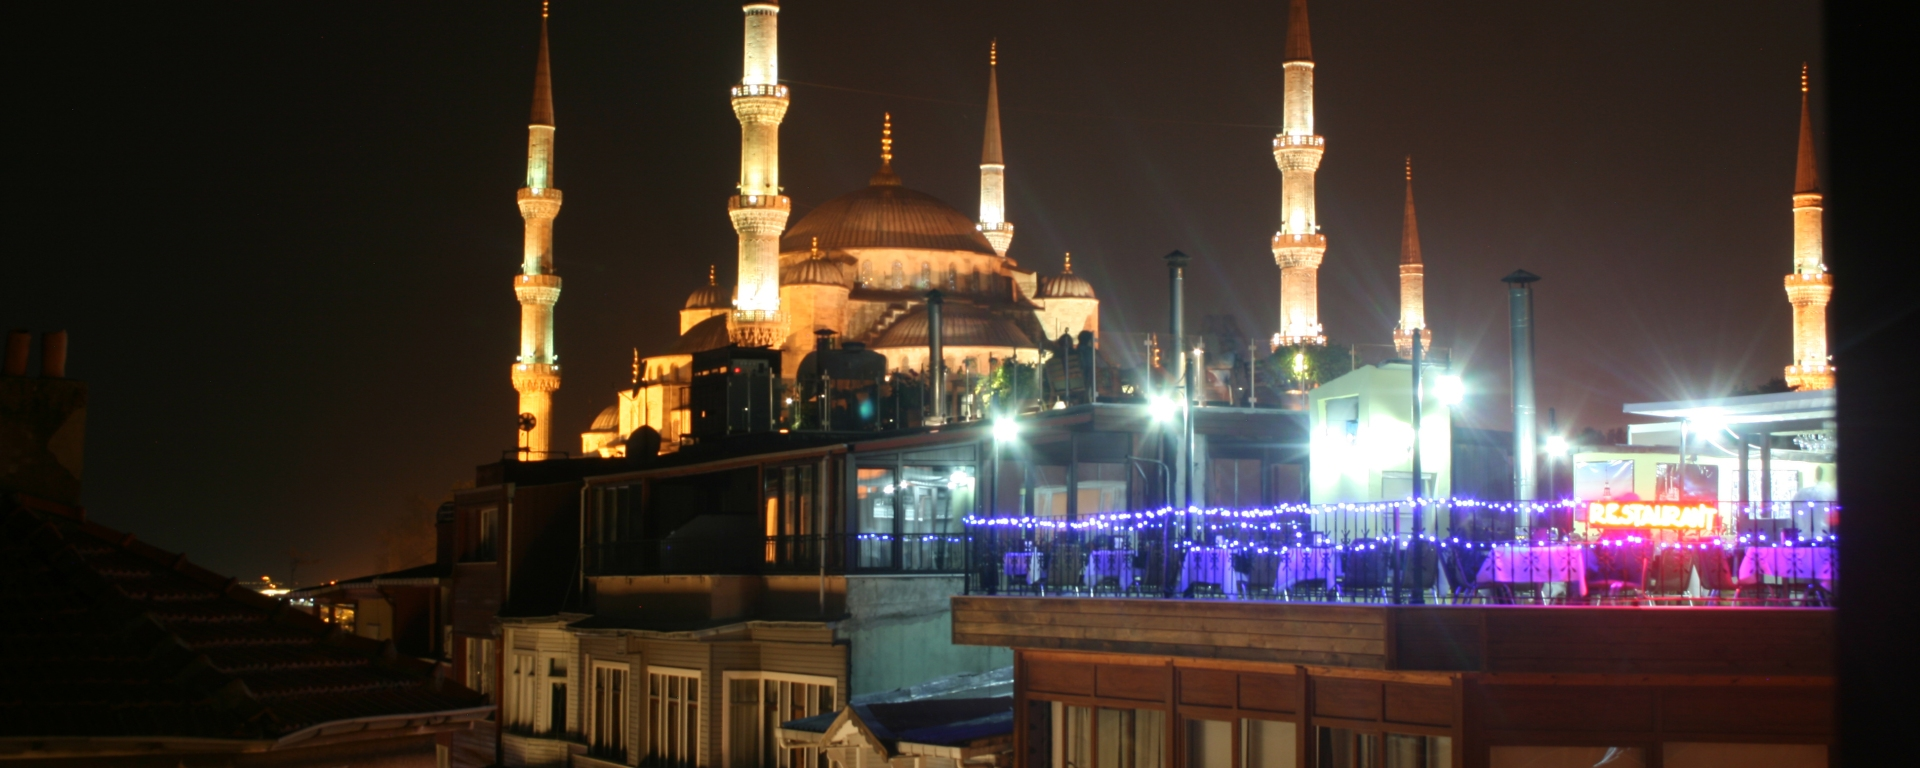 Blue Mosque, Turkey, roof tops, Istanbul, Turkey, night, travel photography, Turkey travel photography